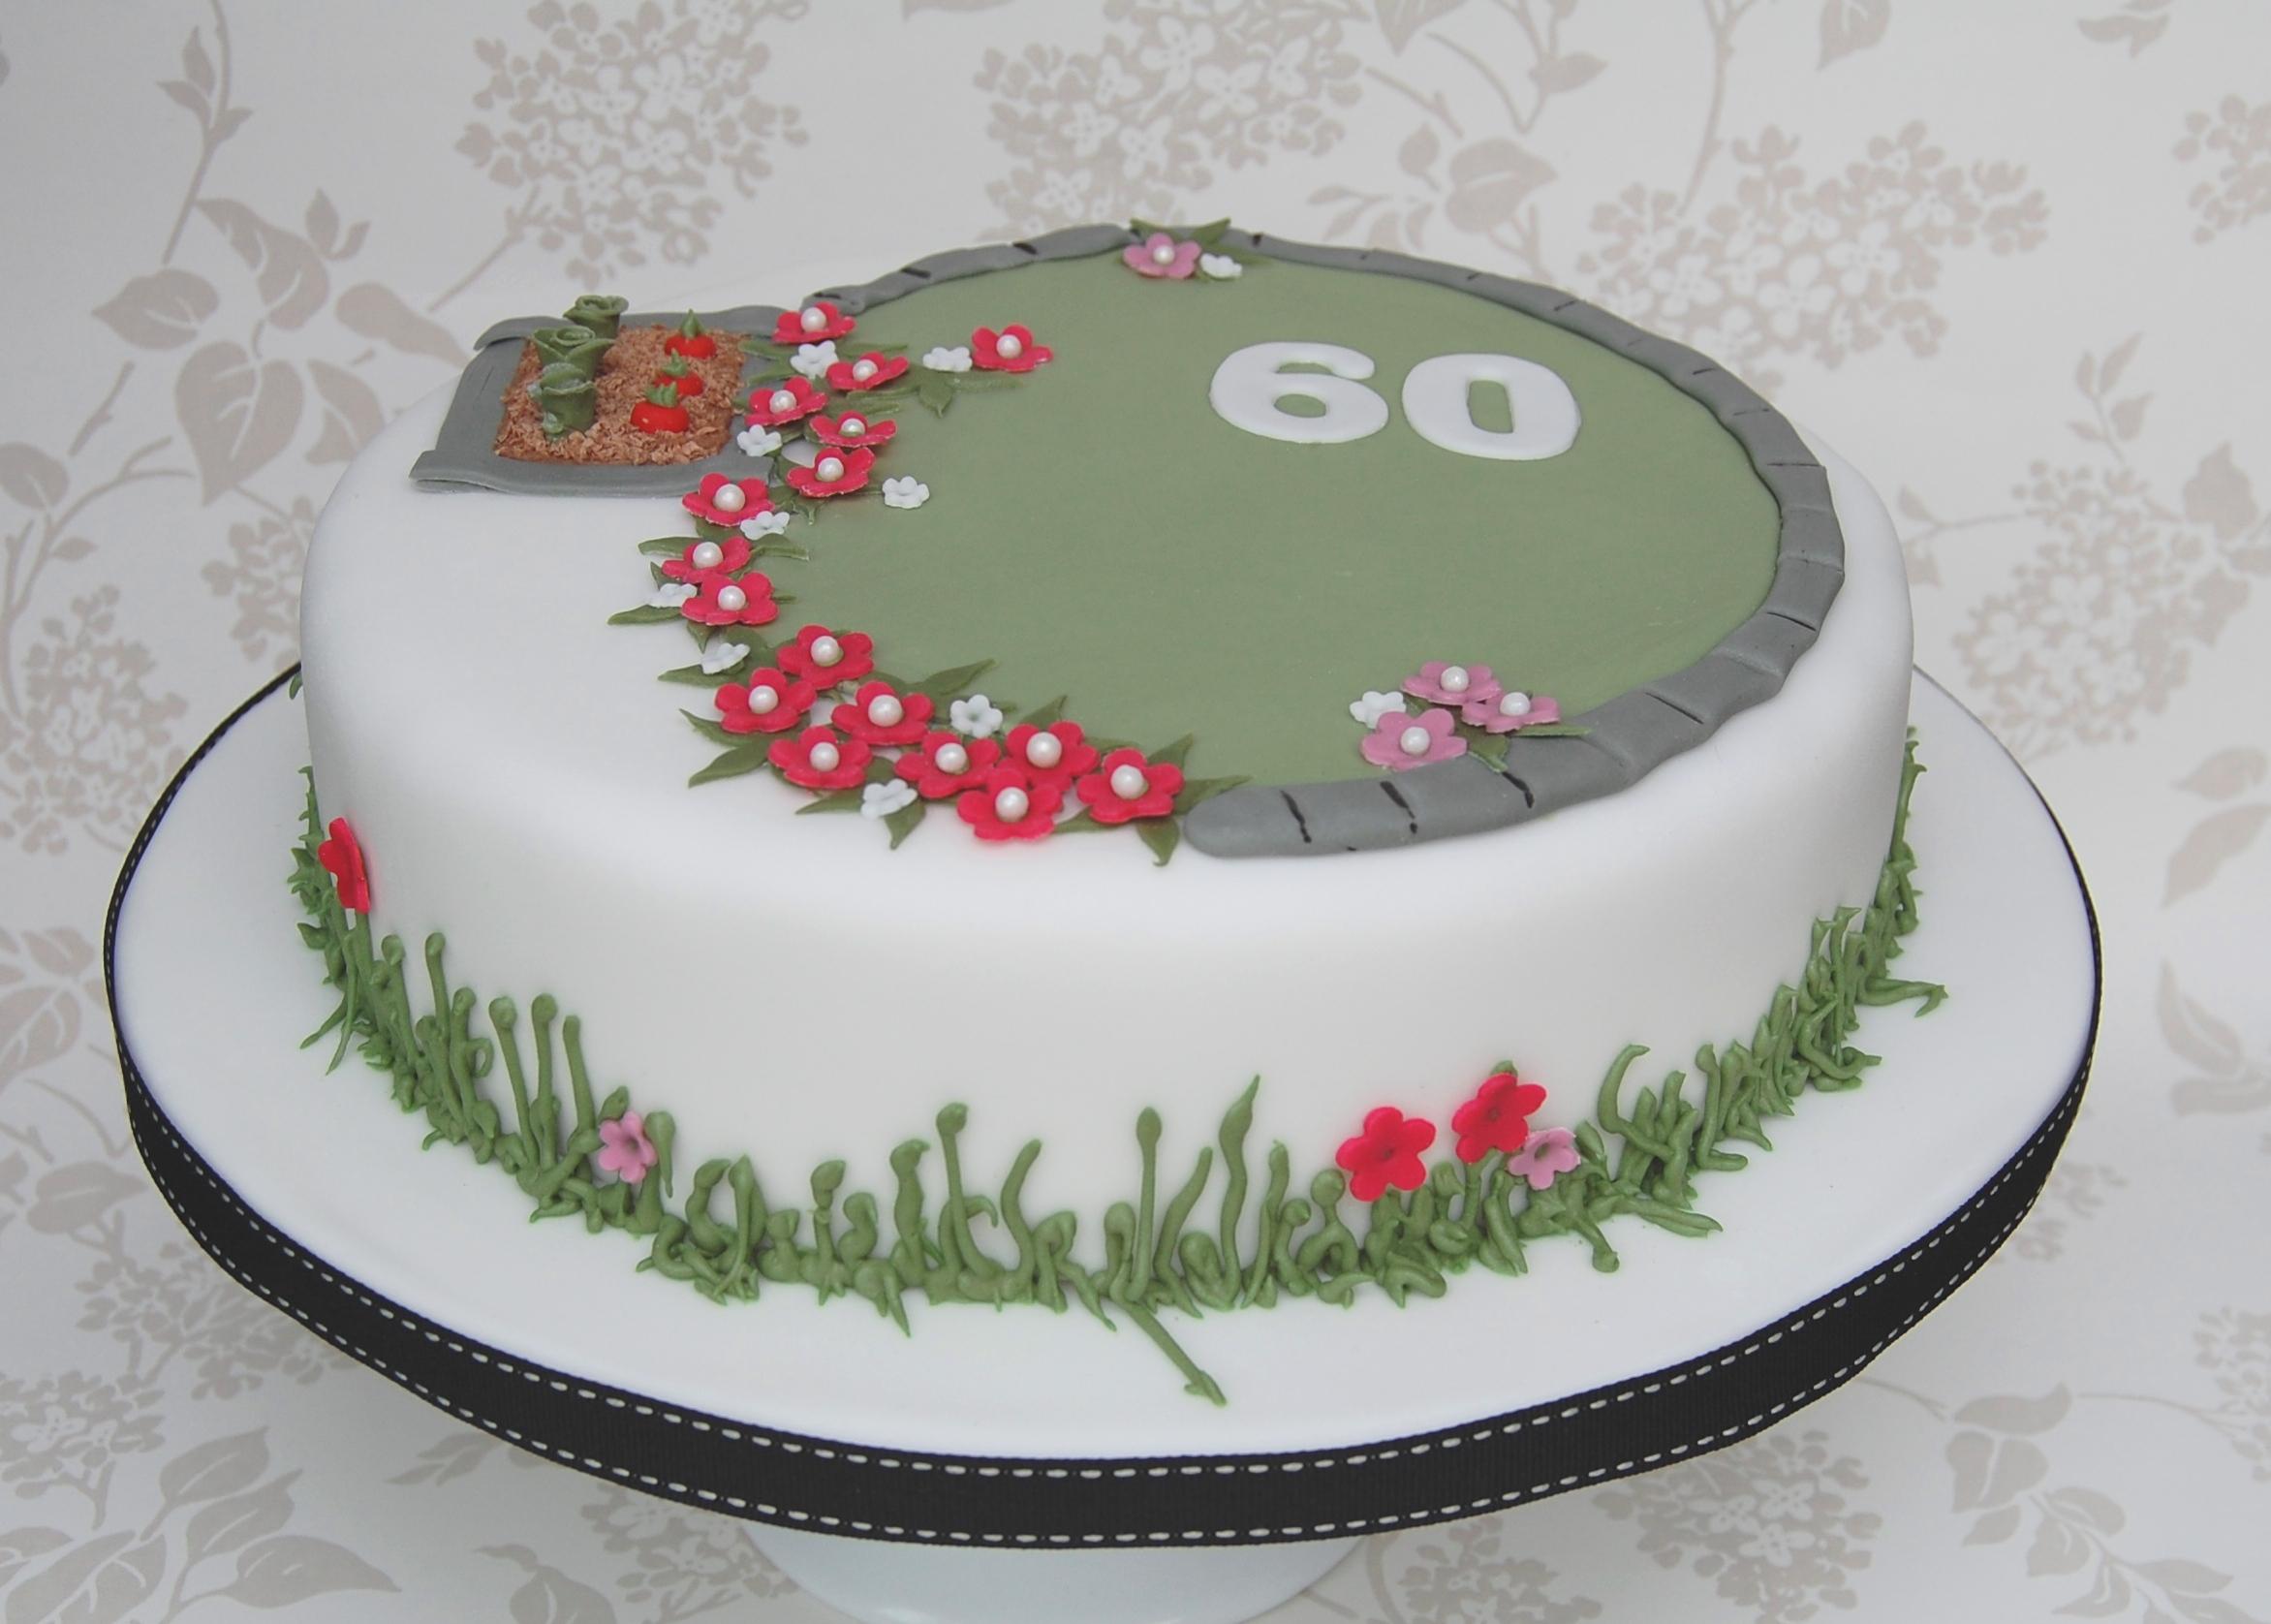 Garden Themed Birthday Cakes Garden Themed Birthday Cake